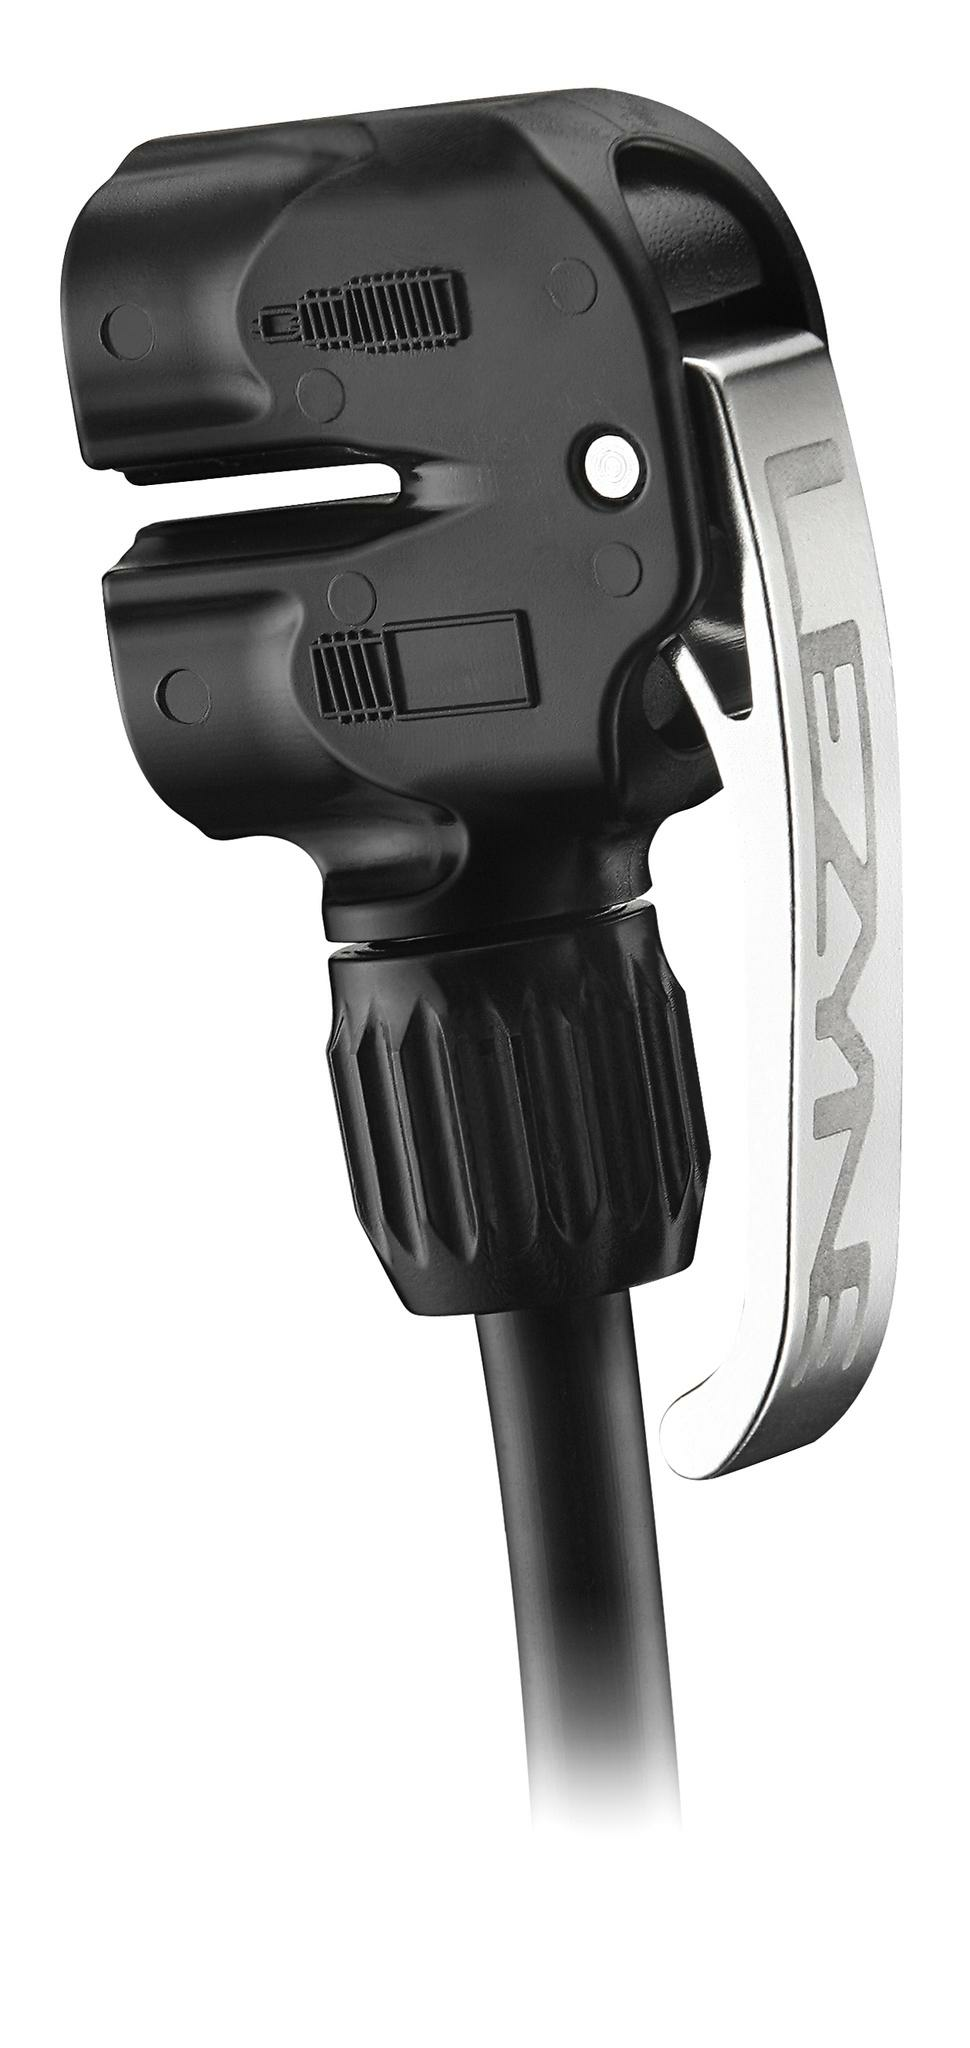 Lezyne Pumpenkopf Dual Valve (DV) Pump Head